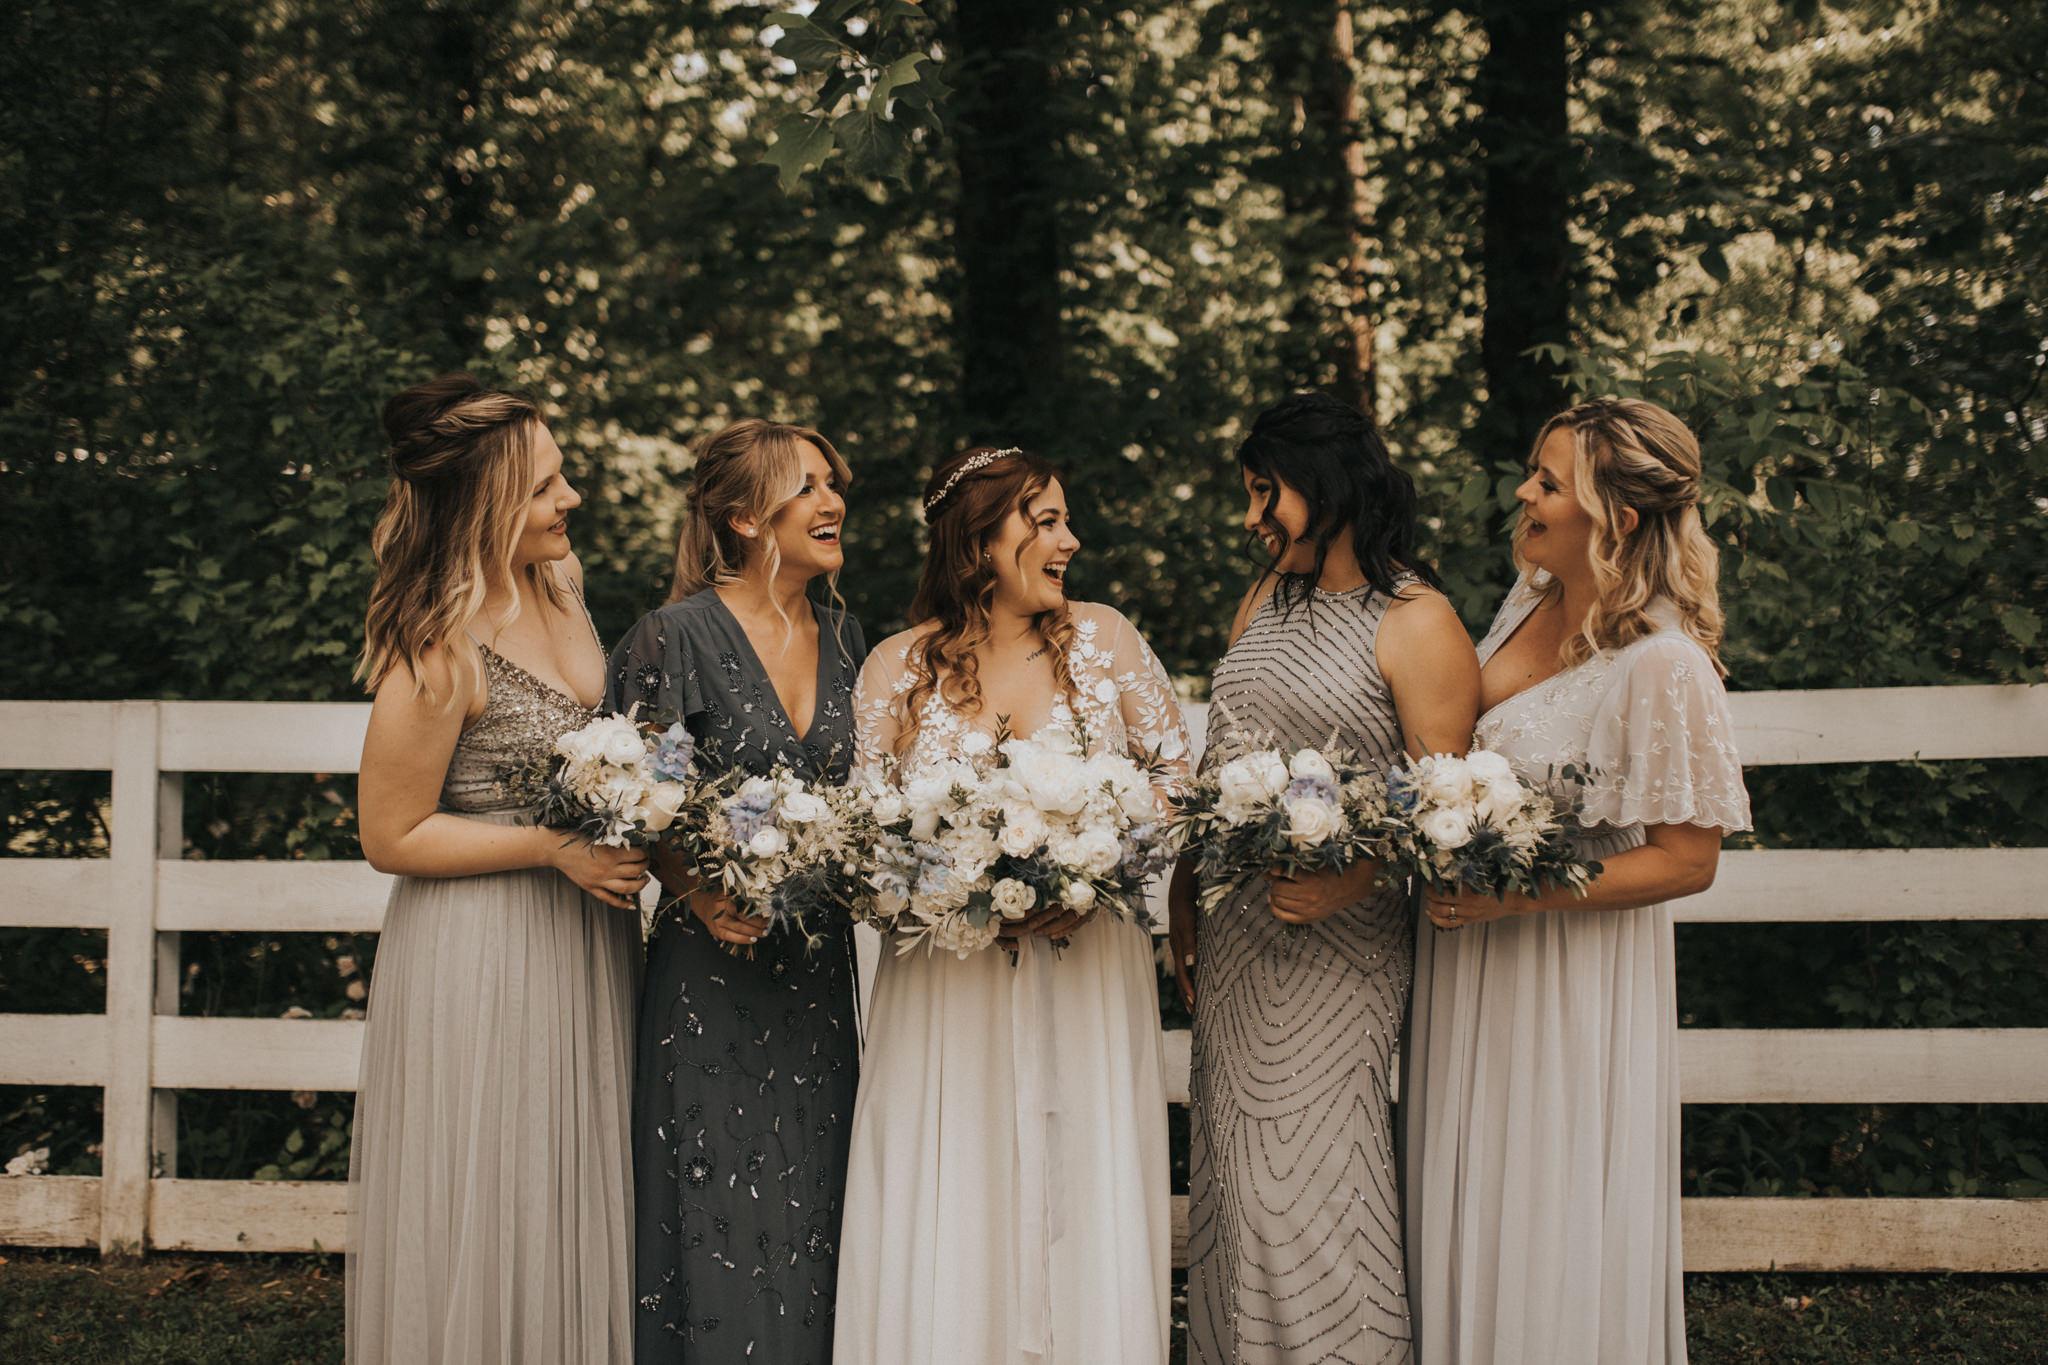 KateMatt-North-Georgia-Wedding-Photographer-Mountain-Laurel-Farm-57.jpg